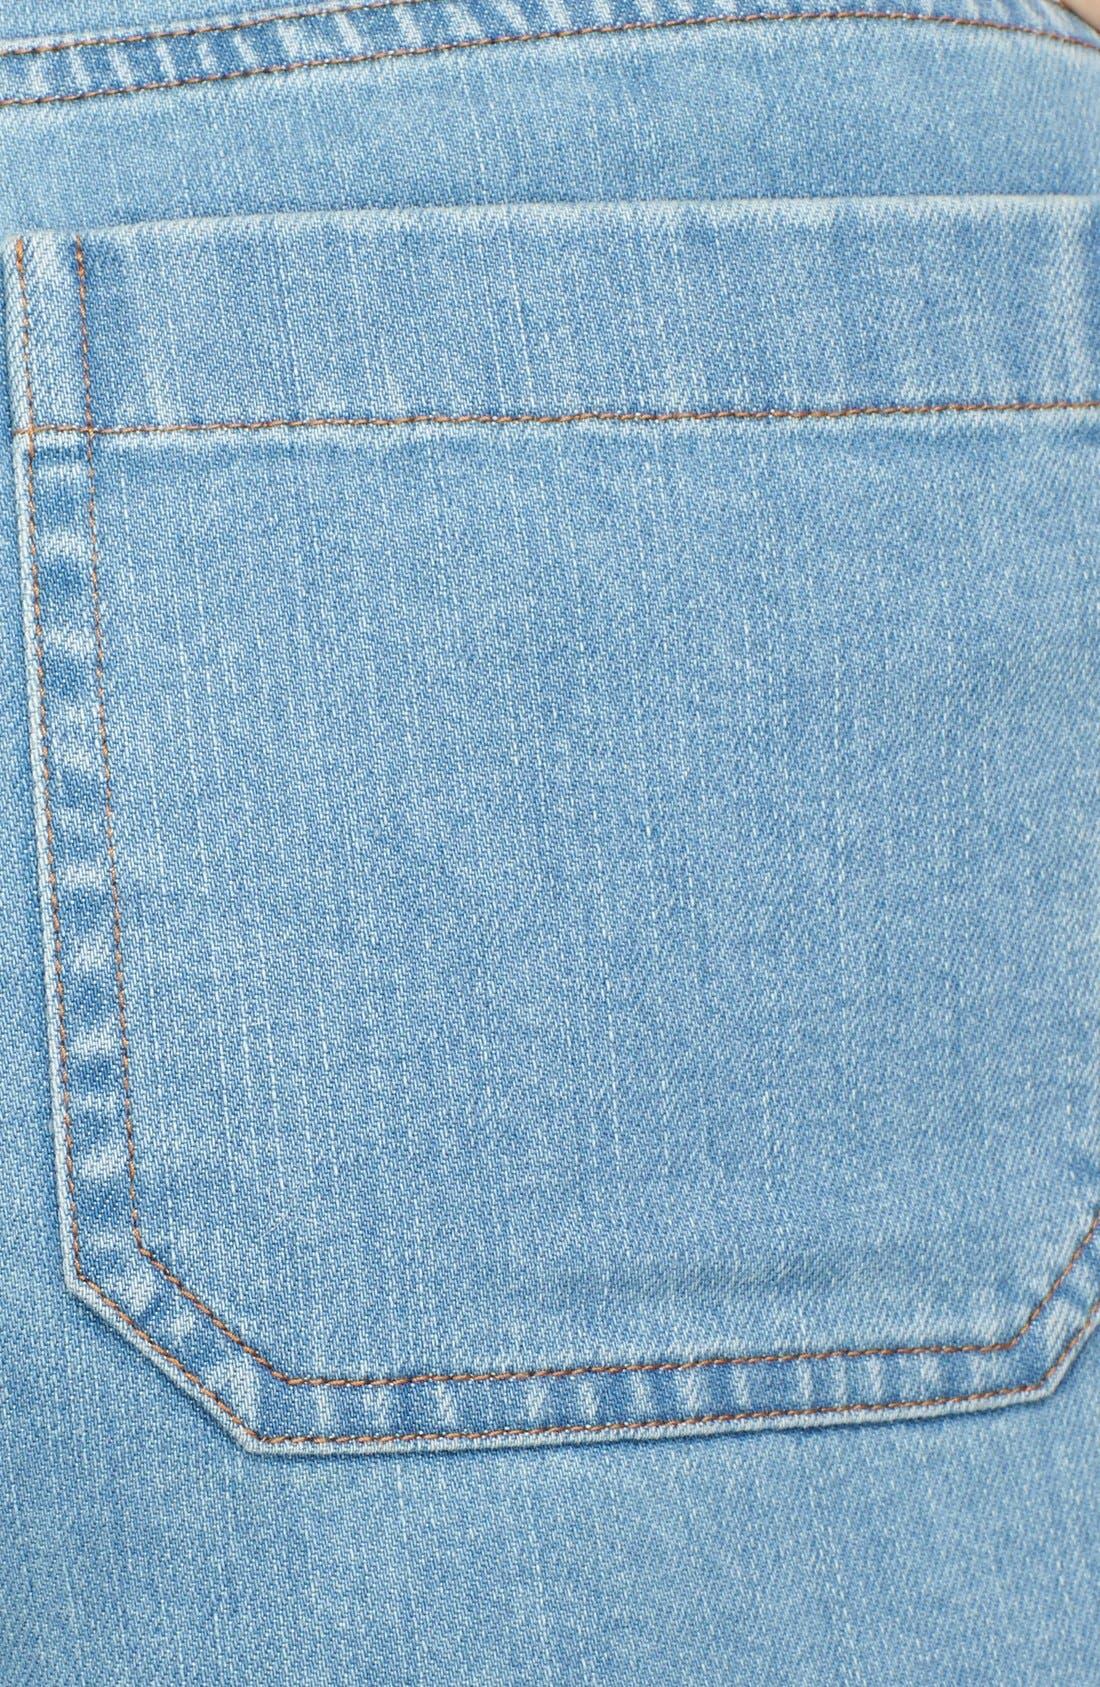 Alternate Image 3  - Michael Kors Bell Bottom Stretch Jeans